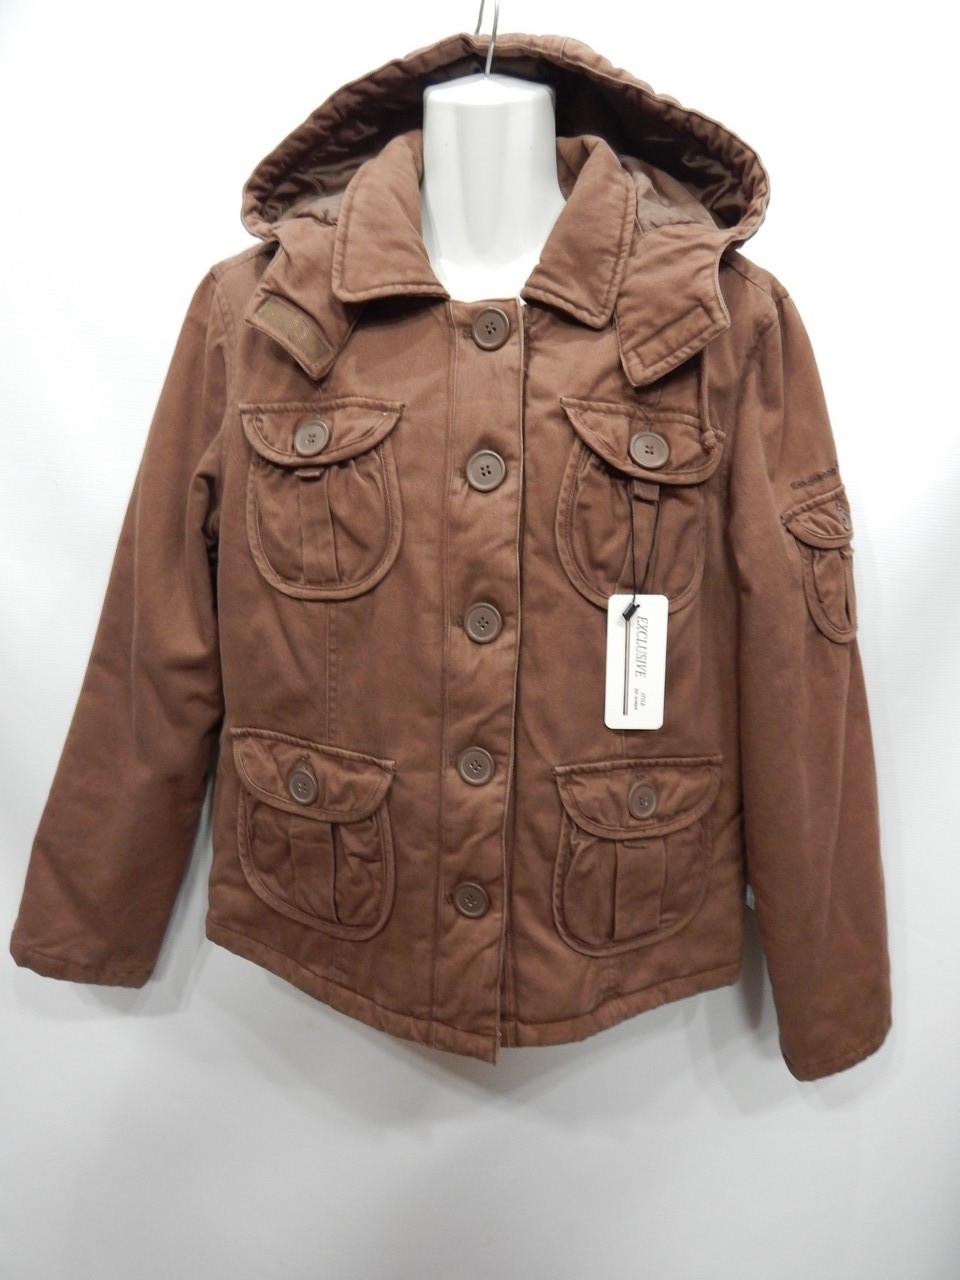 Куртка  женская демисезонная теплая Vintage KangaROOS  р.48-50 011GK